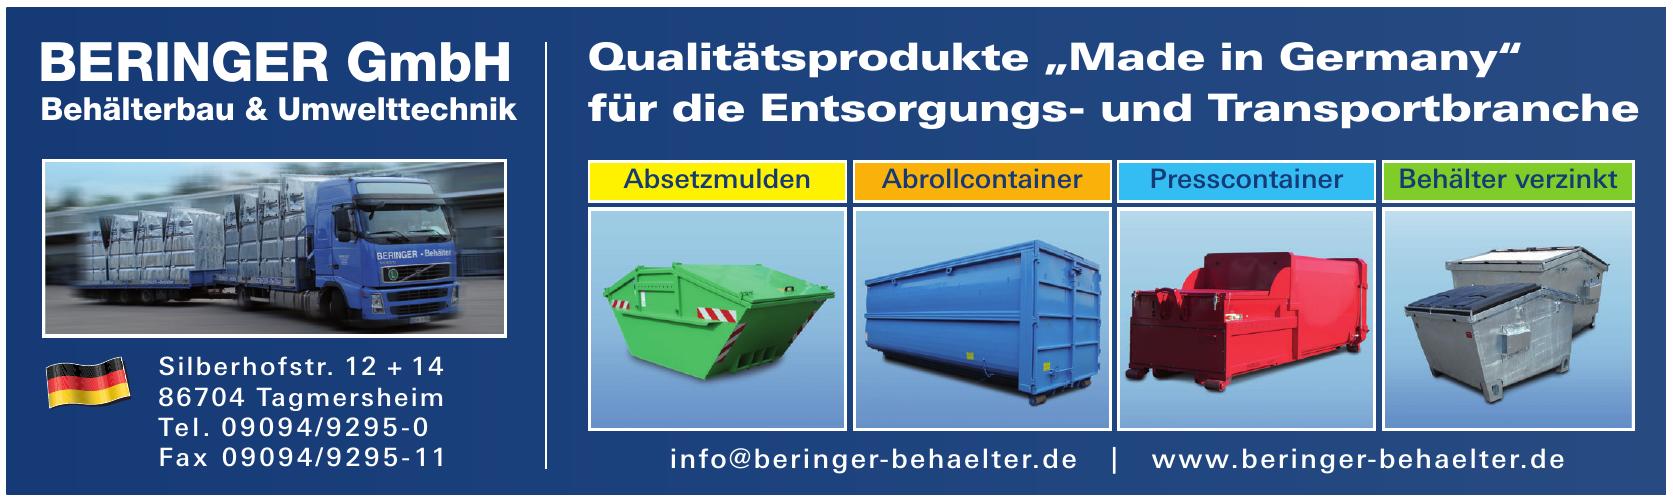 Beringer GmbH Behälterbau & Umwelttechnik